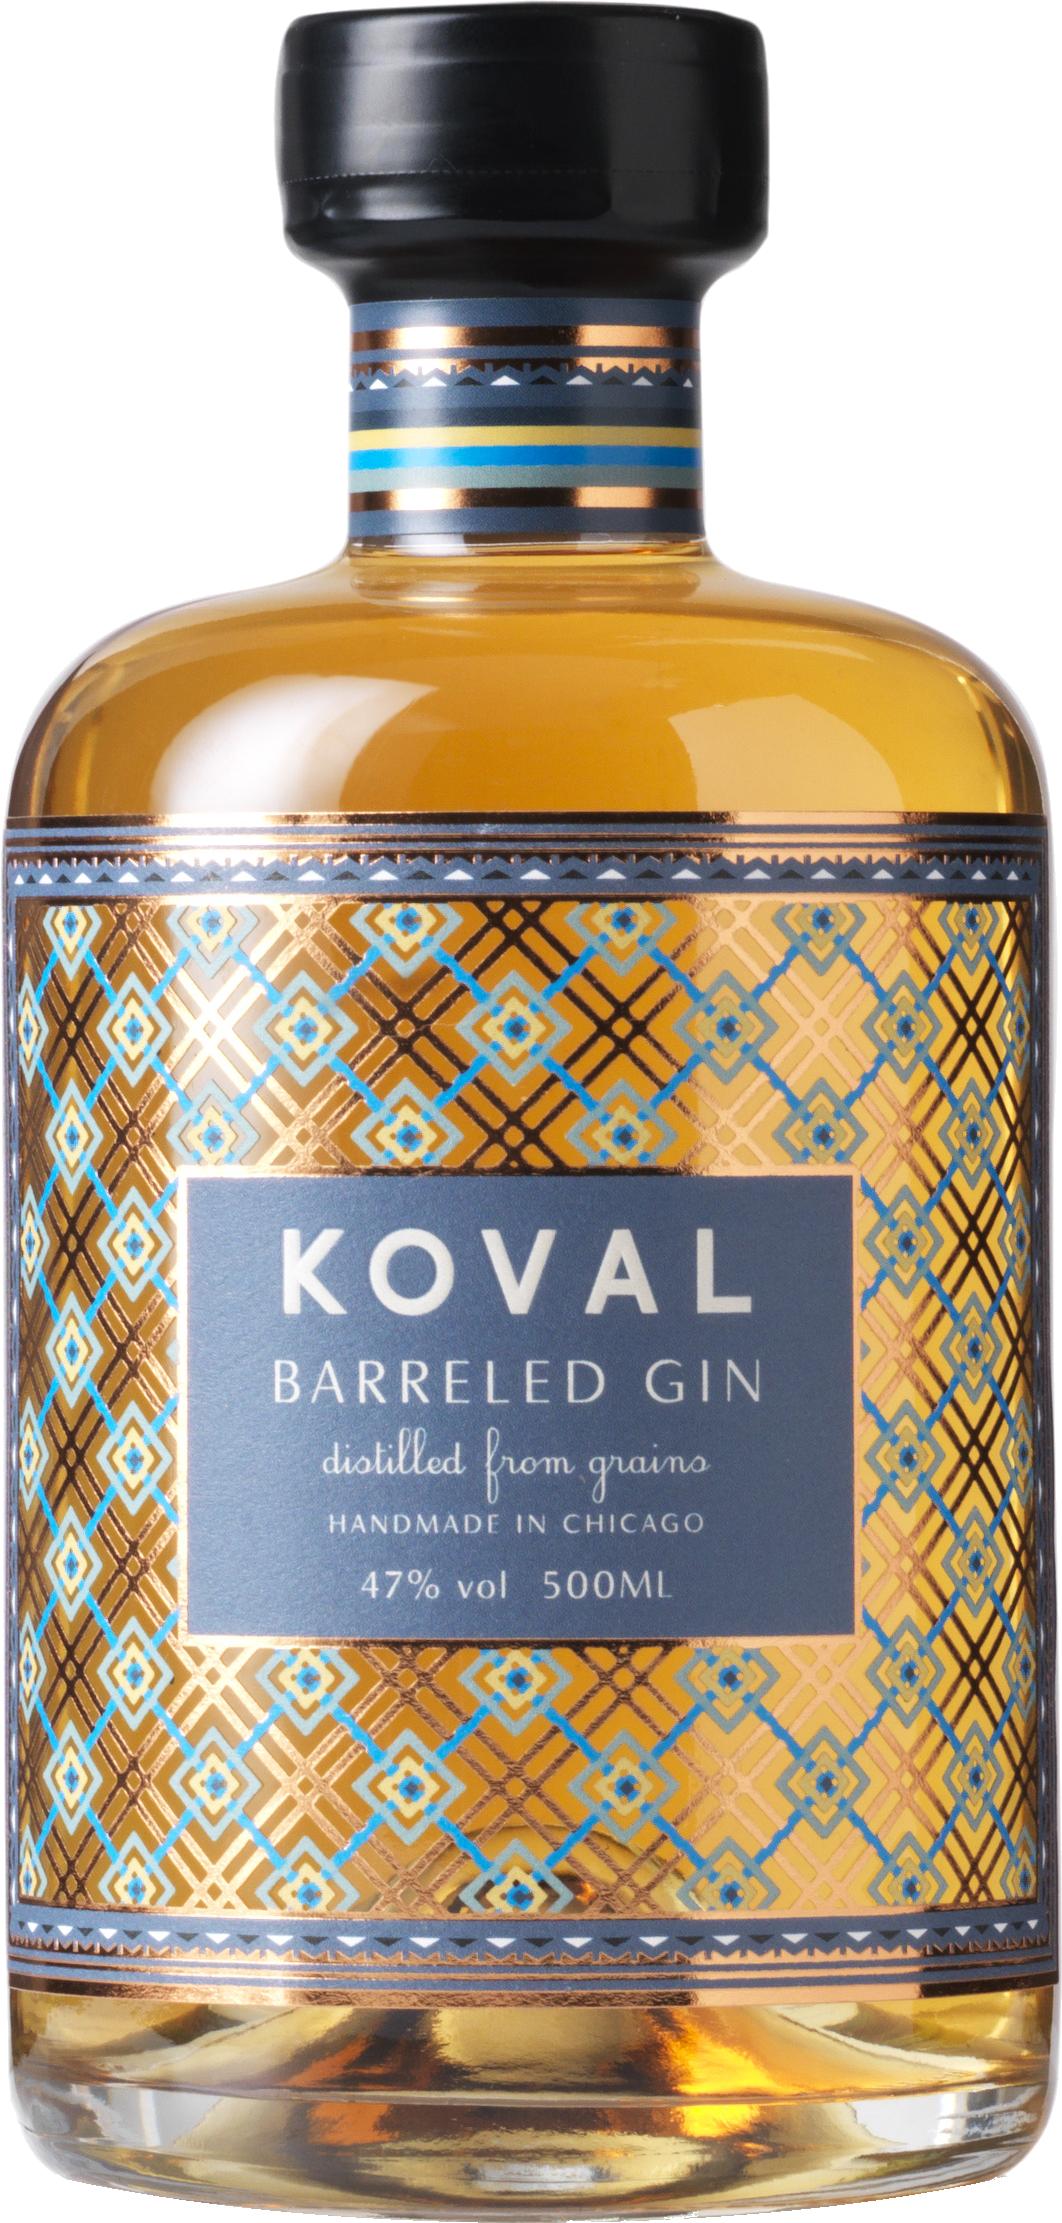 KOVAL - Barreled Gin / 500mL